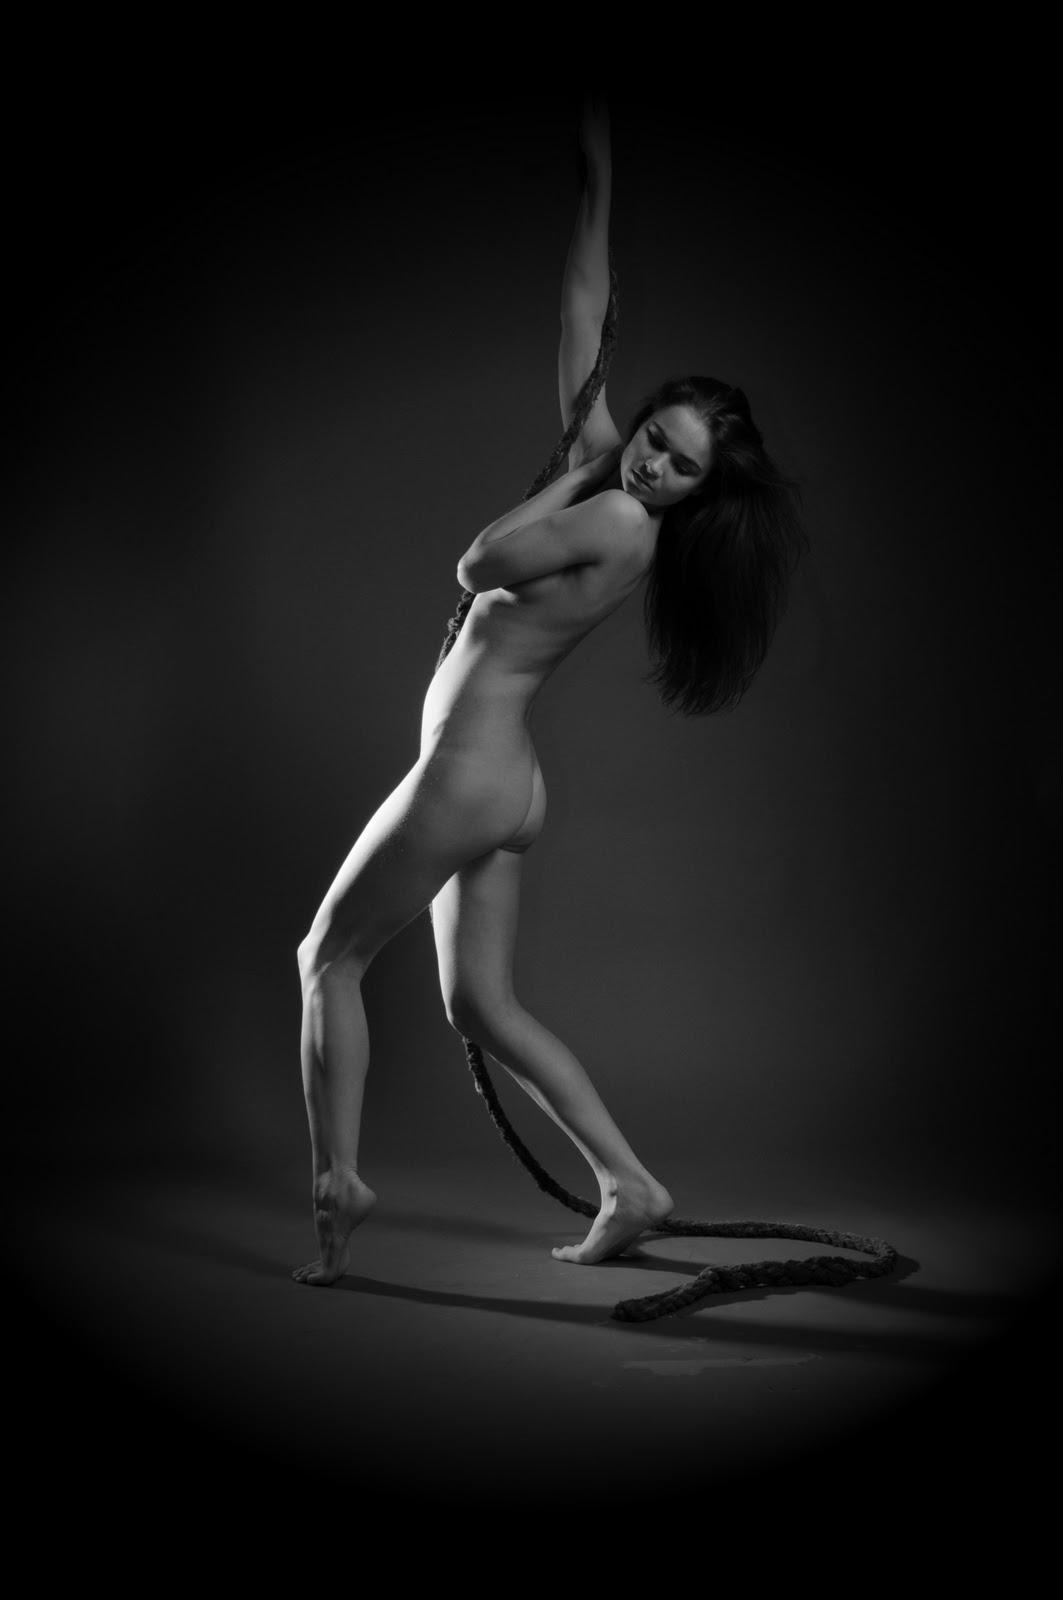 Erotic male photography pics free